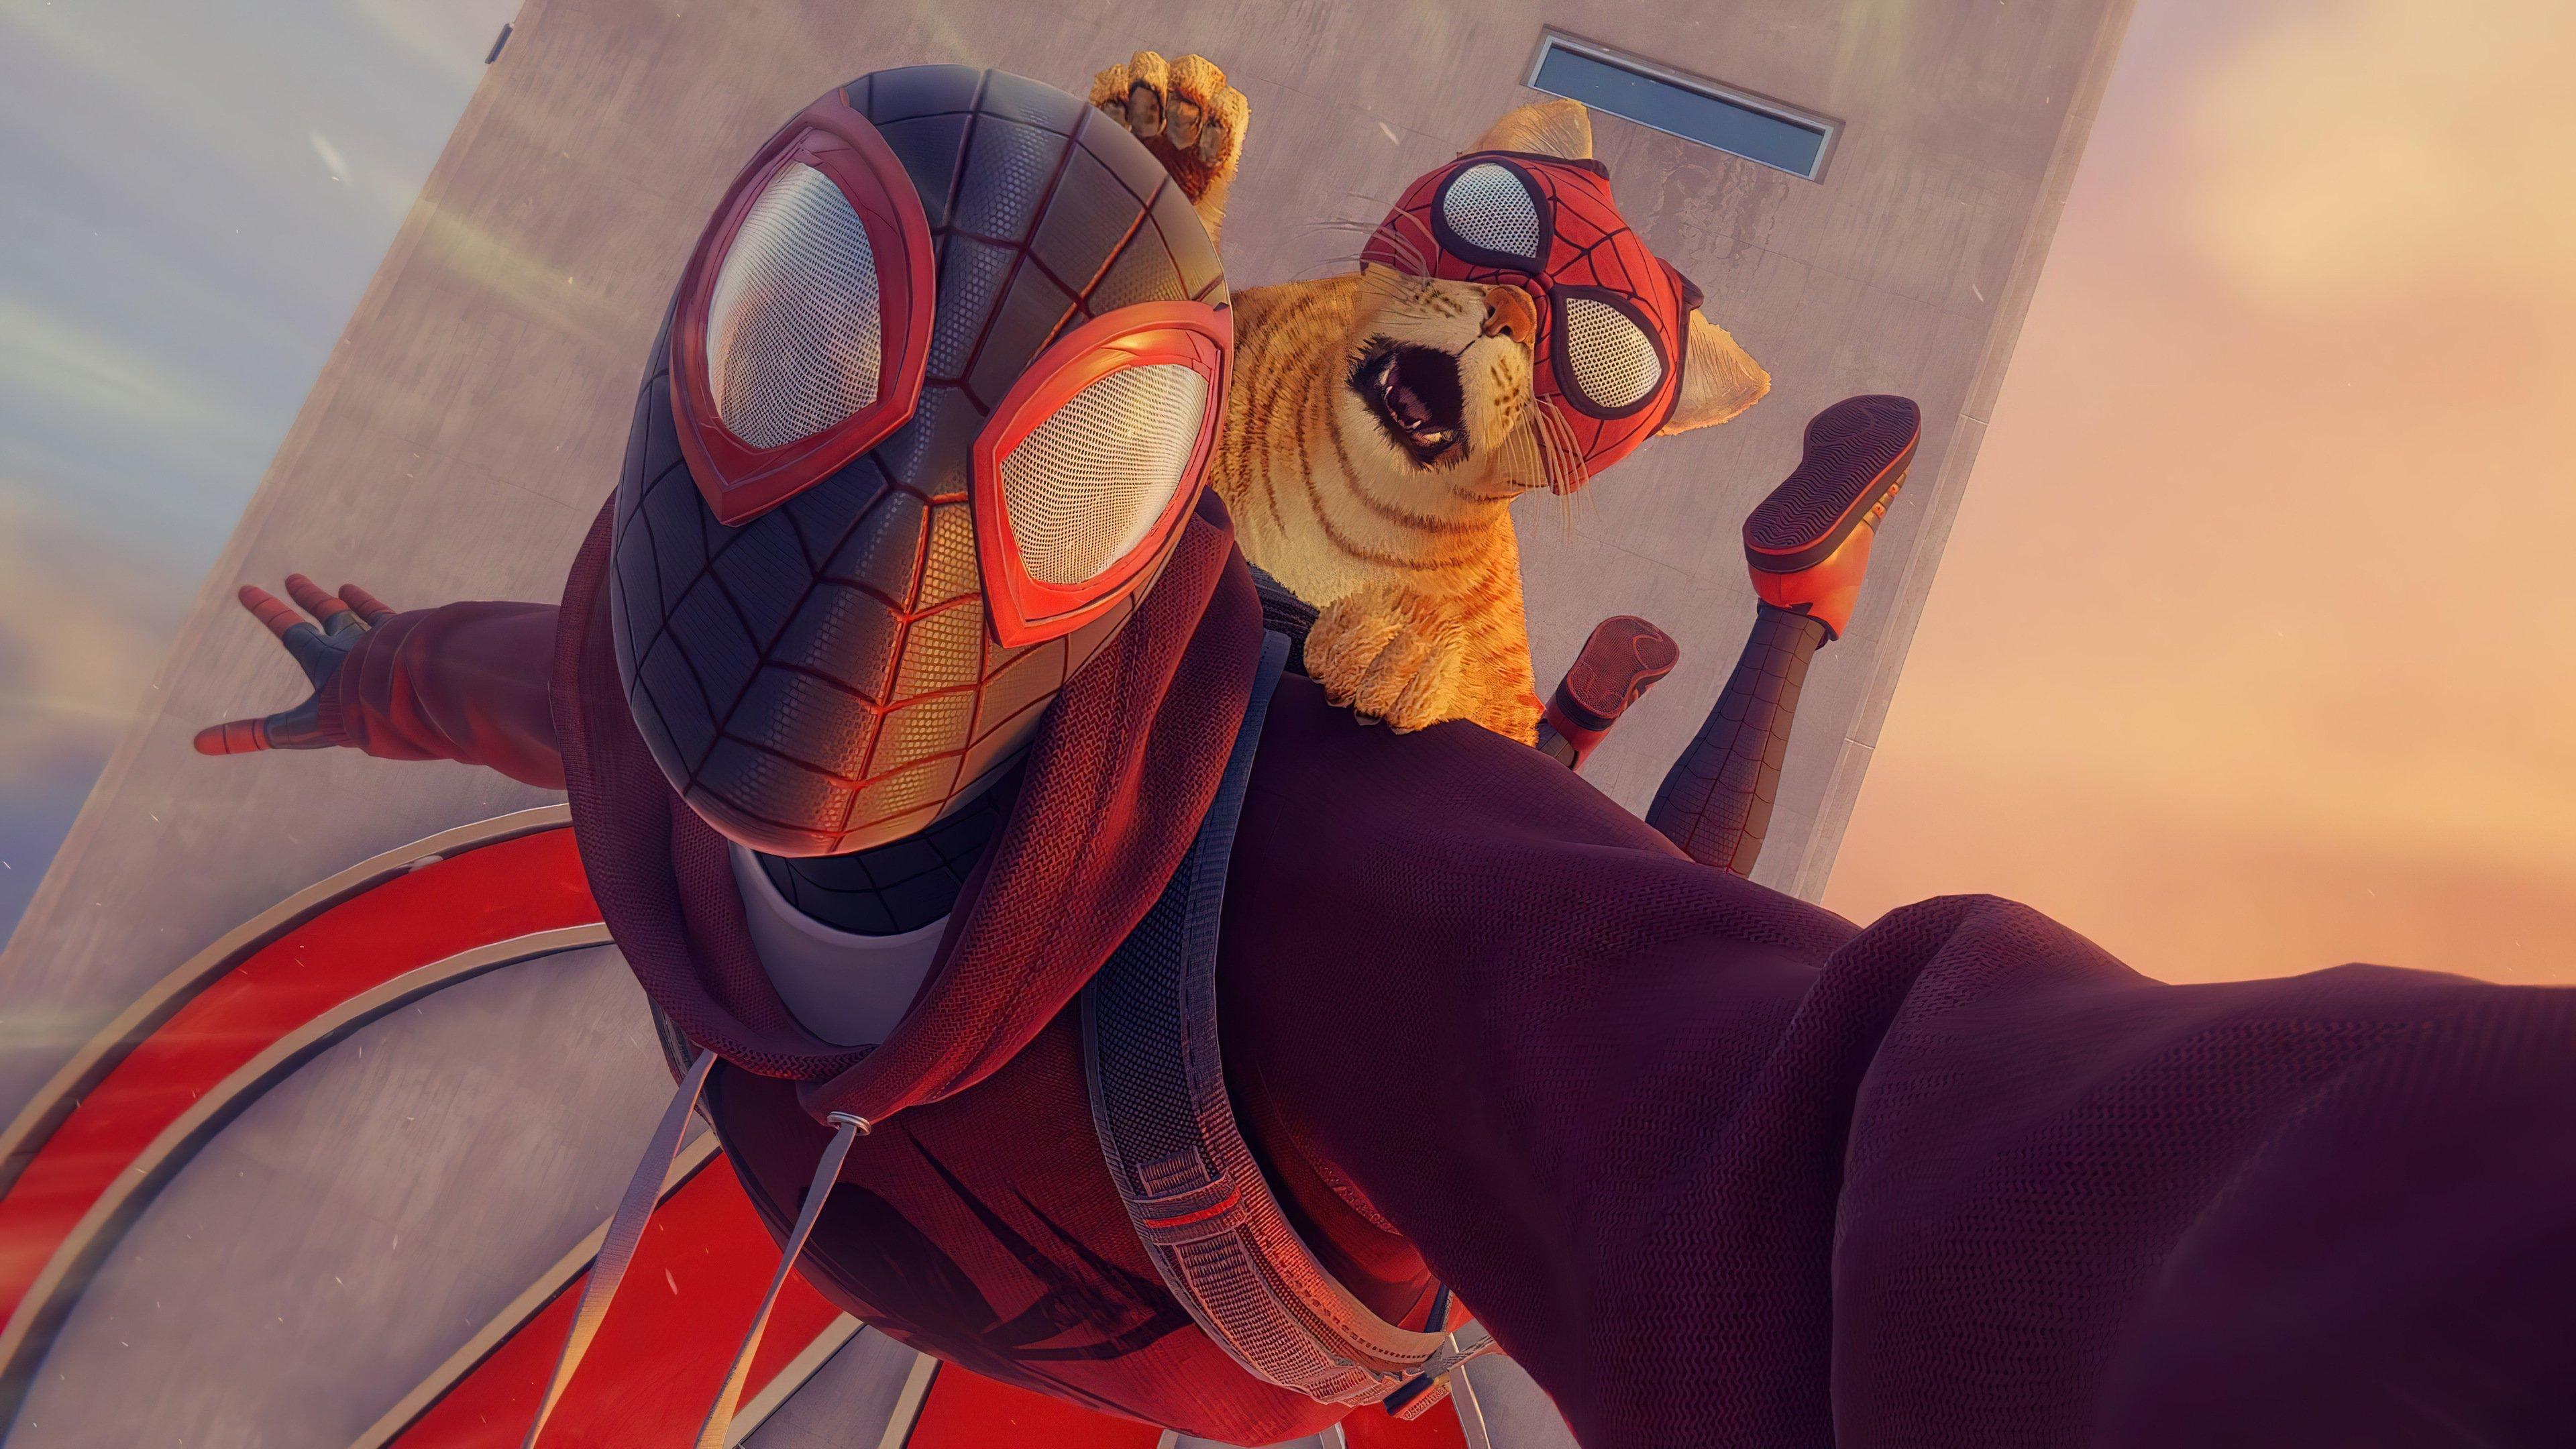 Wallpaper Spiderman and Spidercat